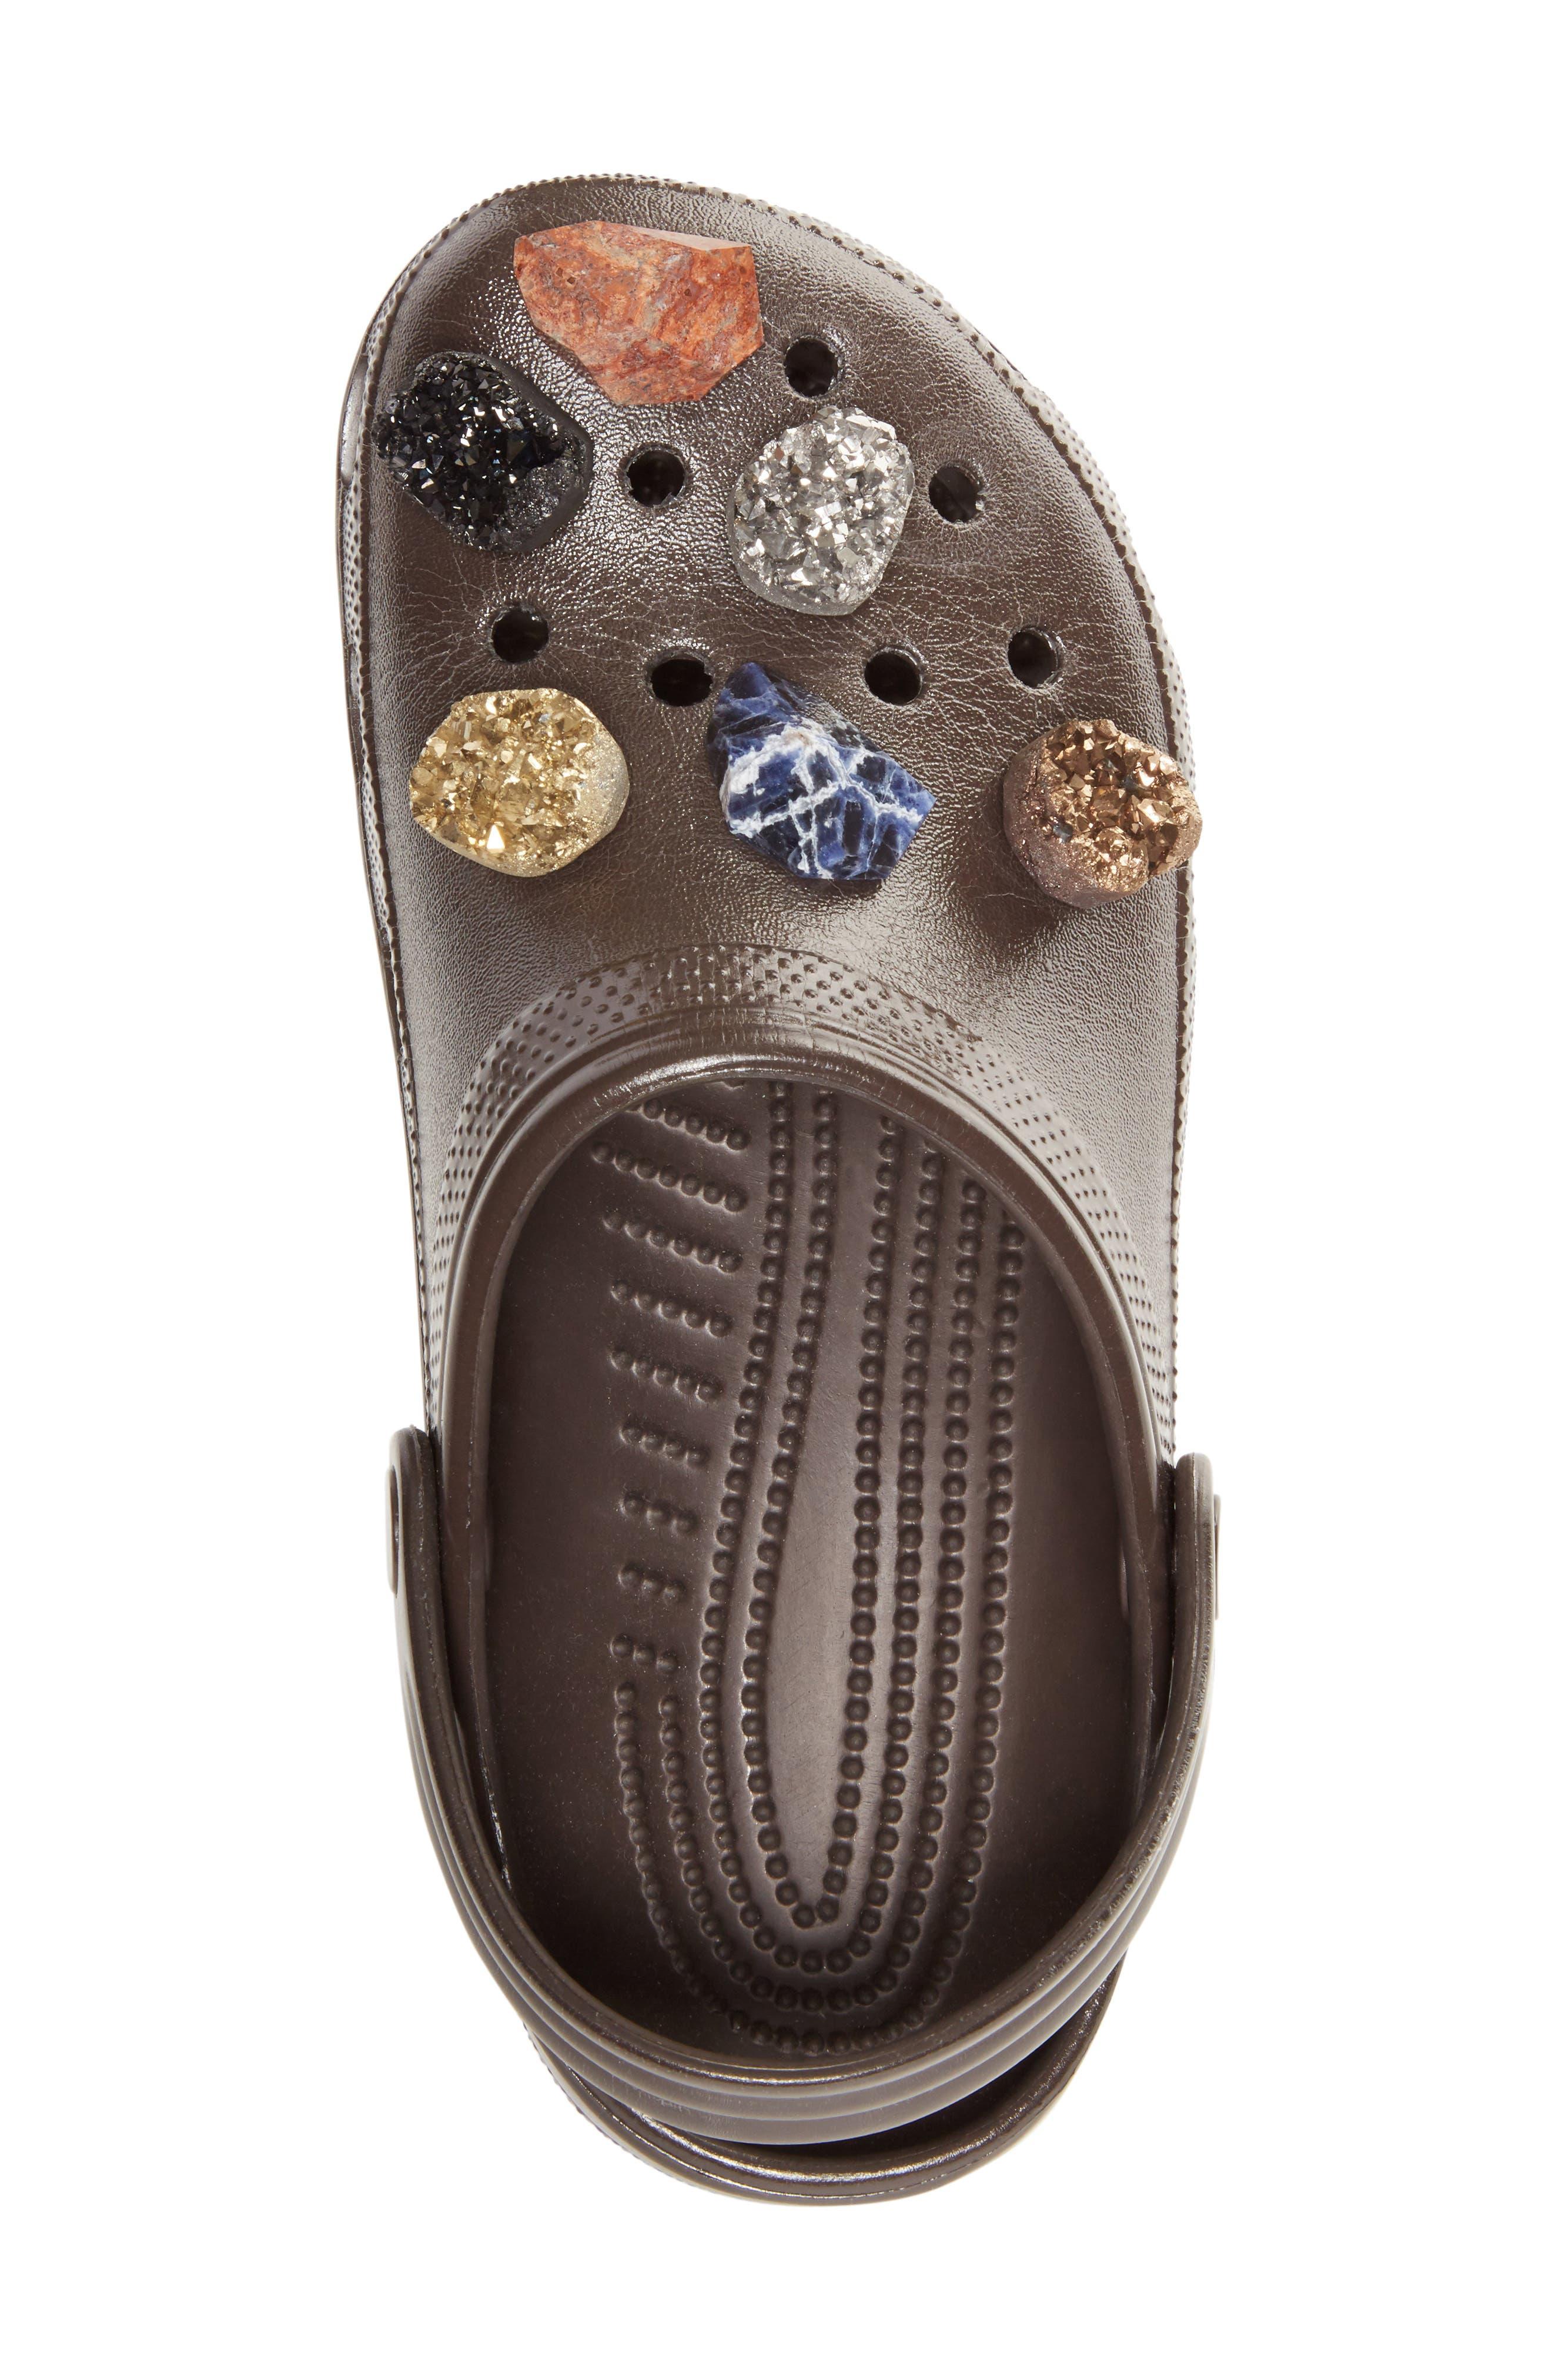 CHRISTOPHER KANE, x CROCS<sup>™</sup> Multi Stone Clog Sandal, Alternate thumbnail 3, color, 200